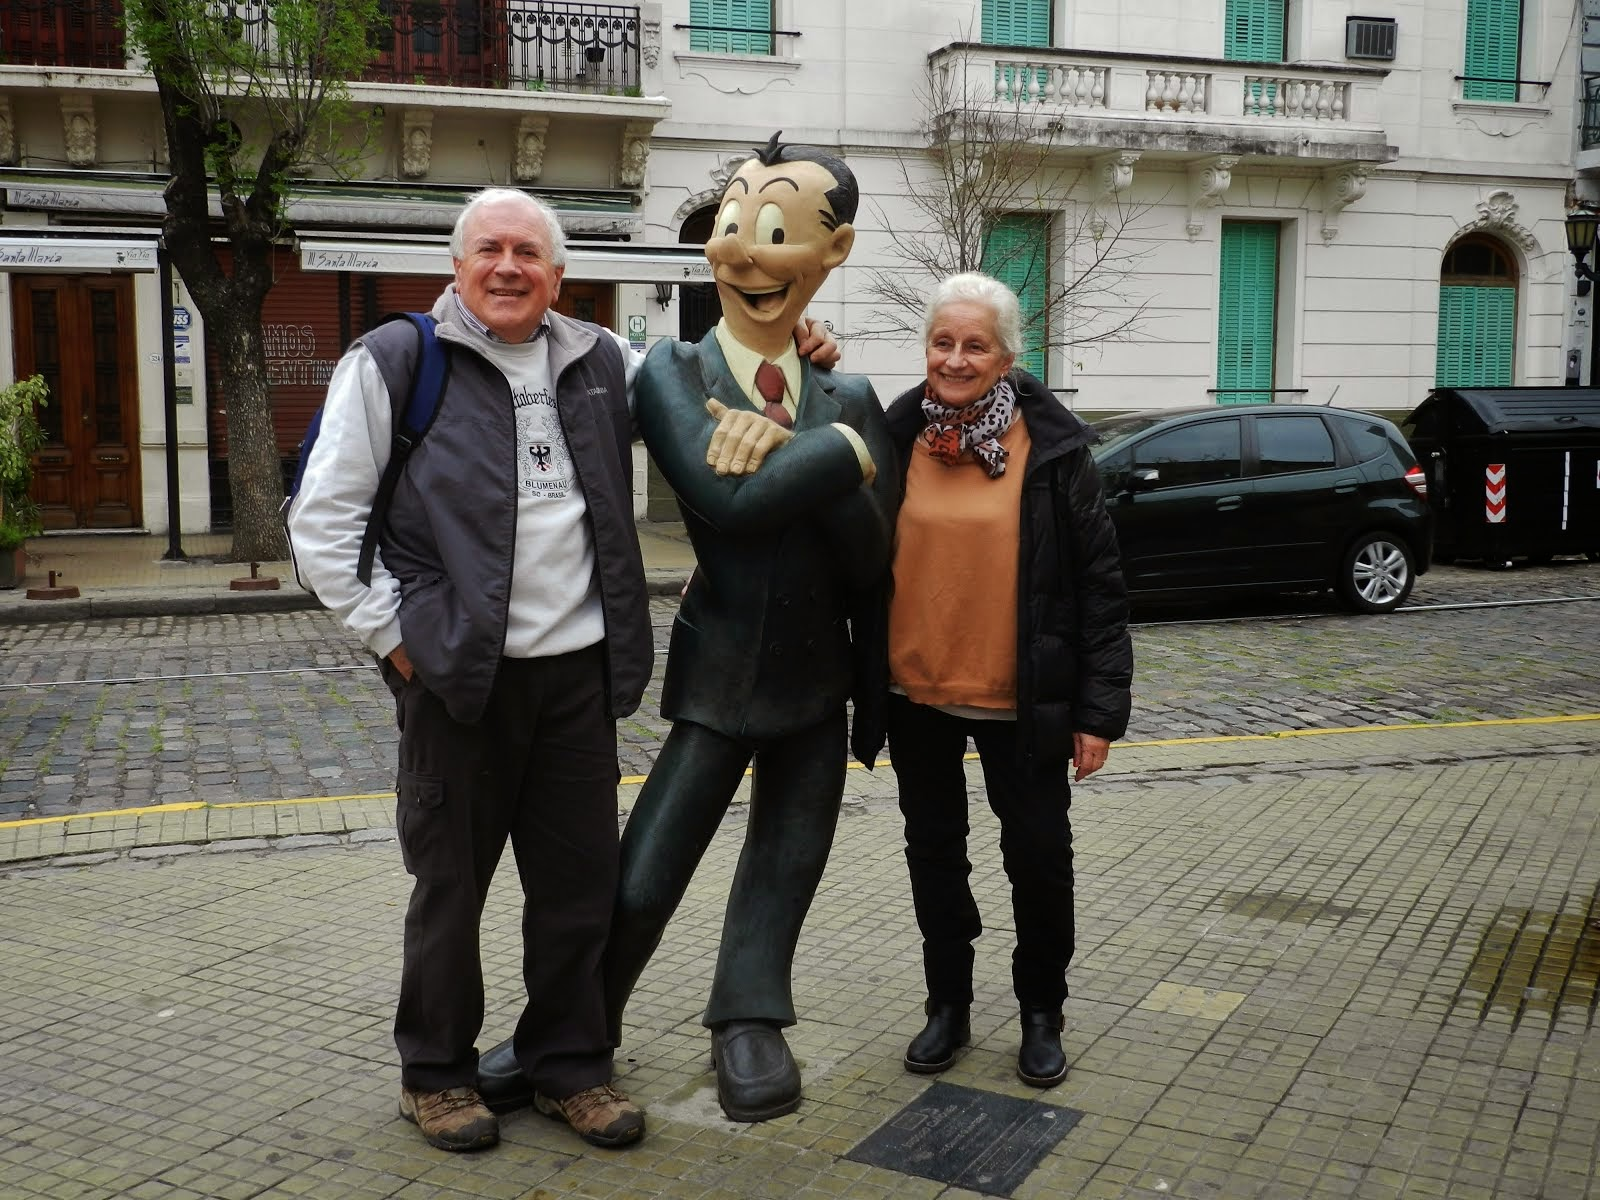 Octubre 2014 en San Telmo (Bs As)